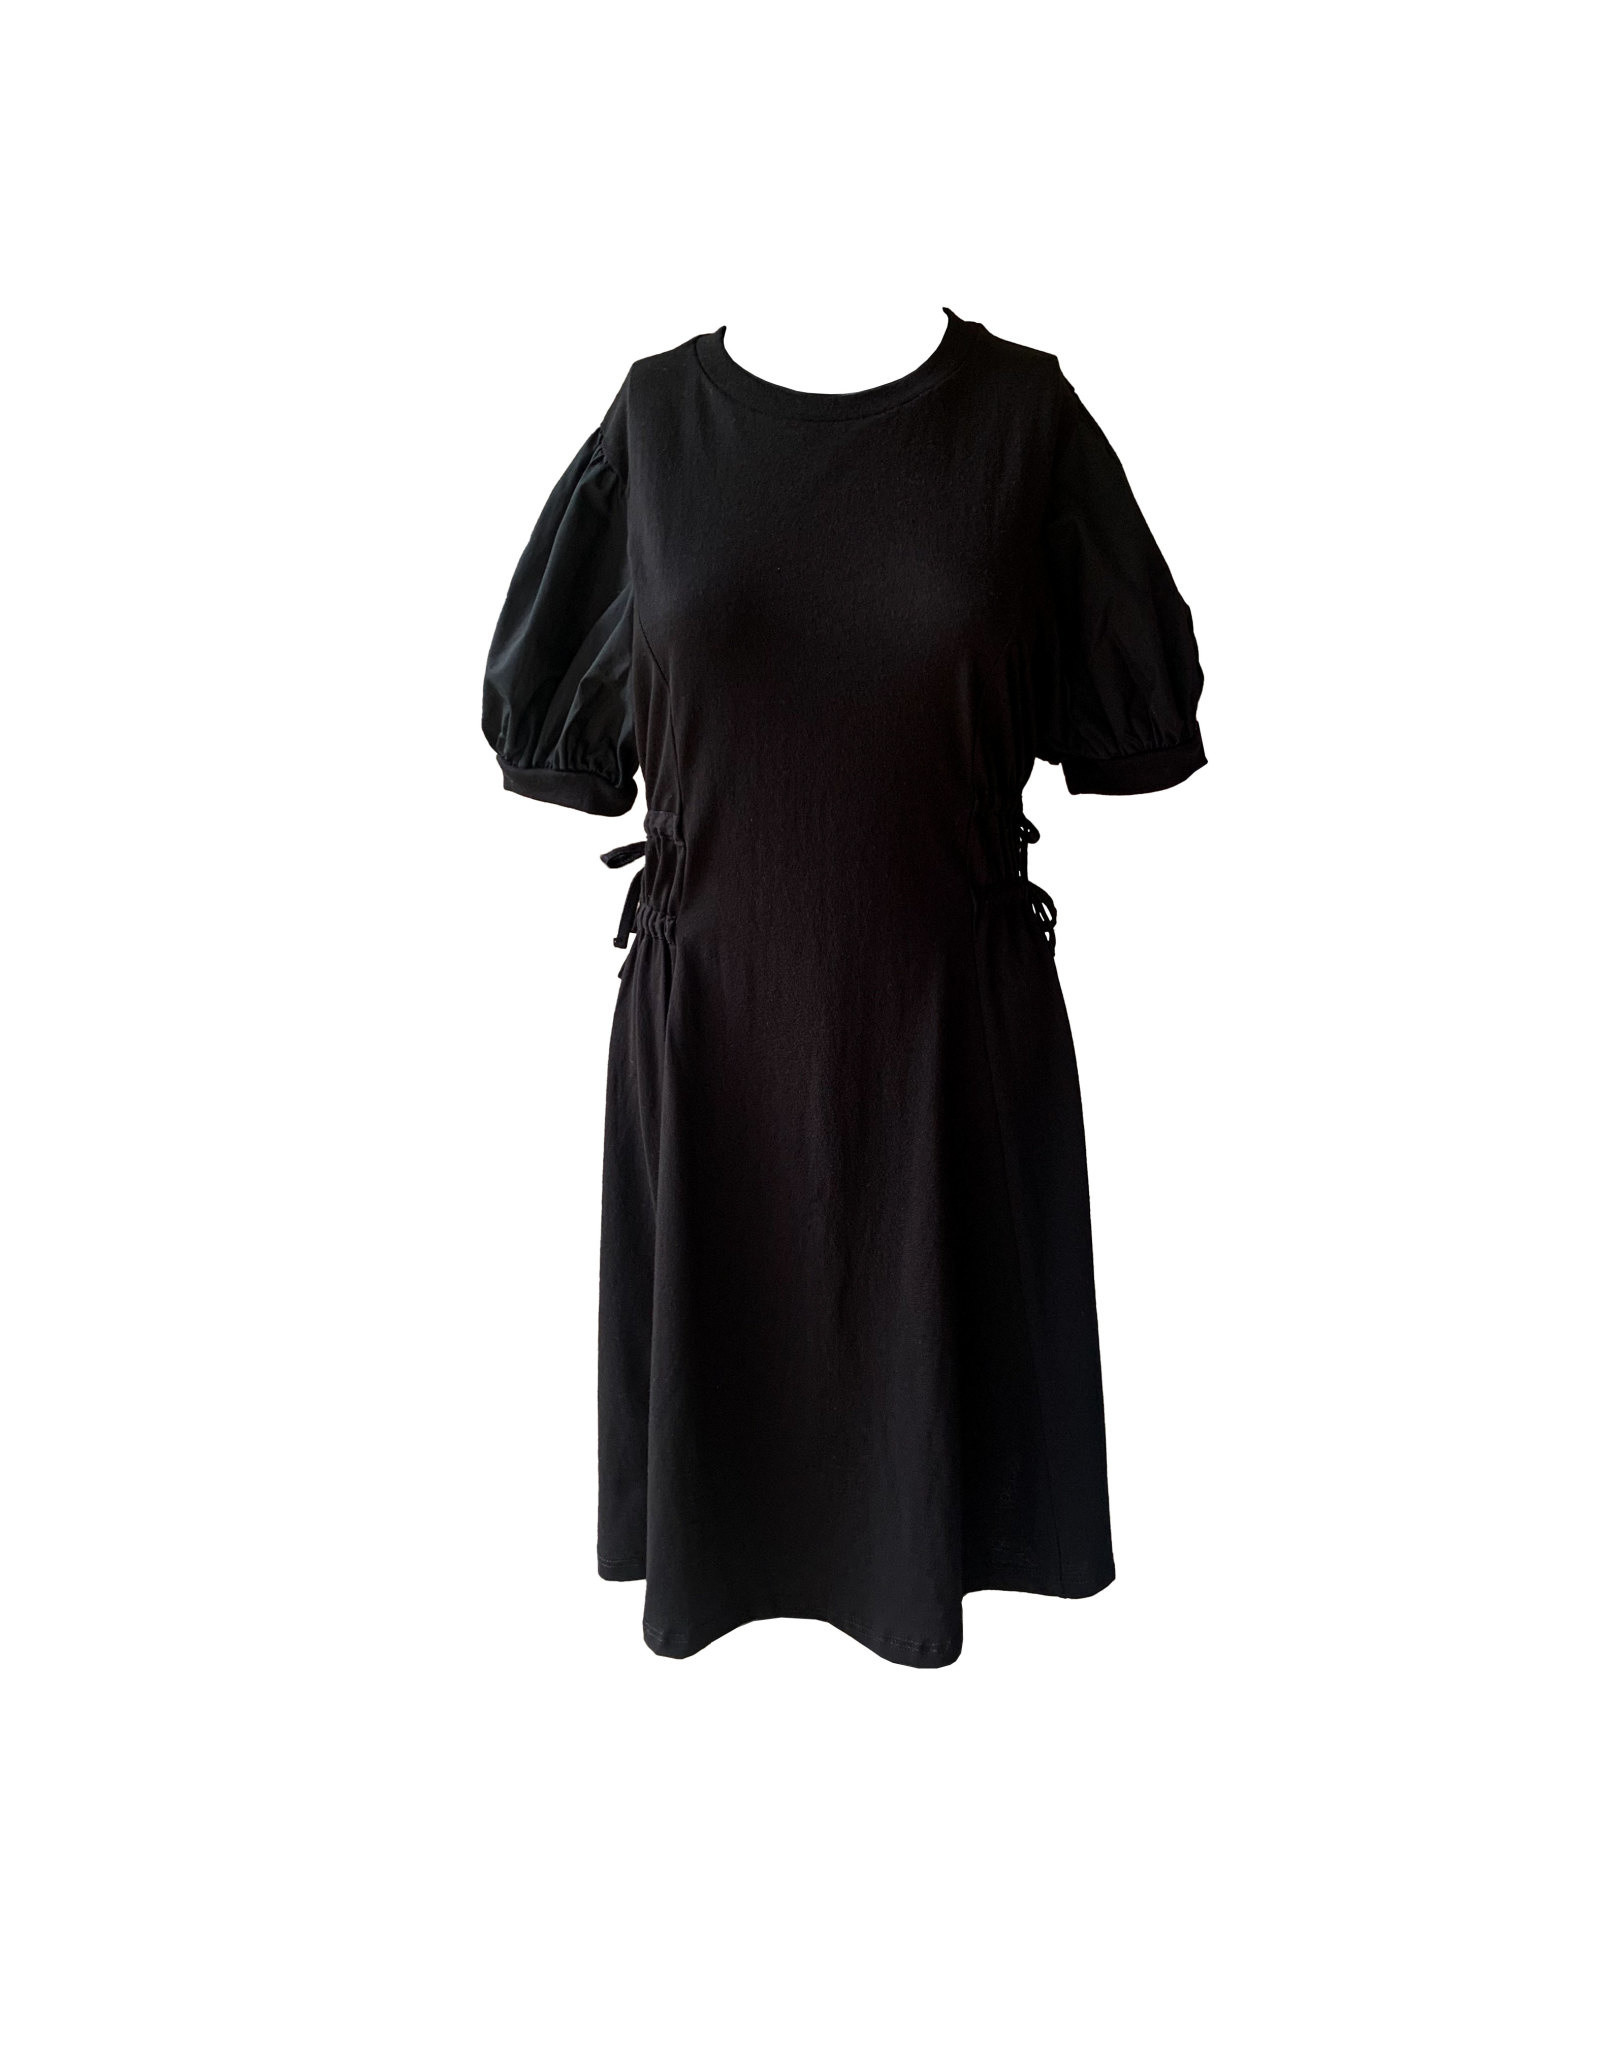 TOPSHOP TOPSHOP Poplin Sleeve Mini Dress In Black